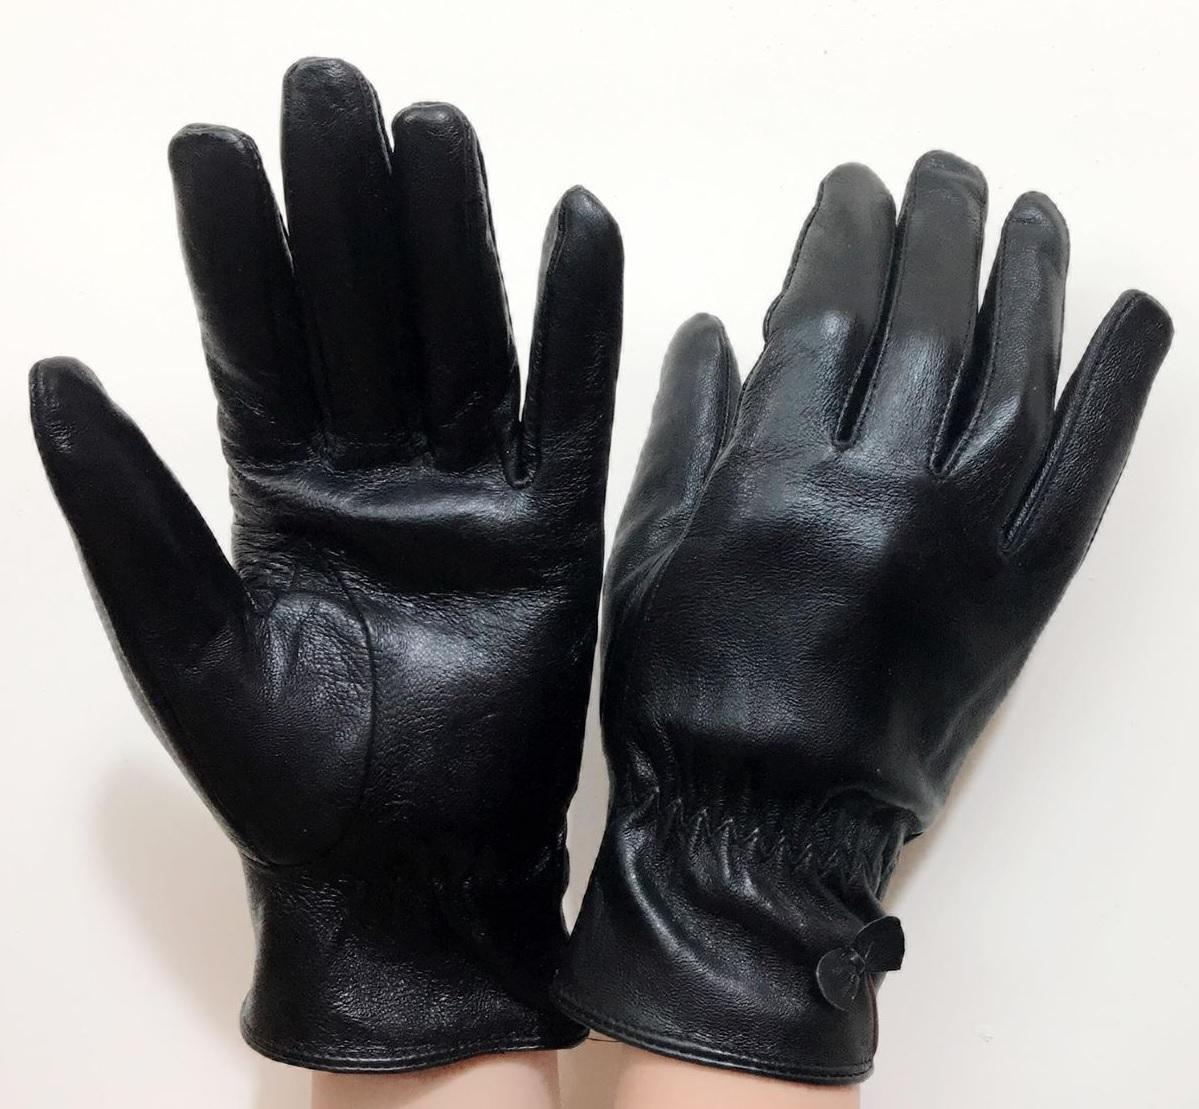 găng tay da thật nữ